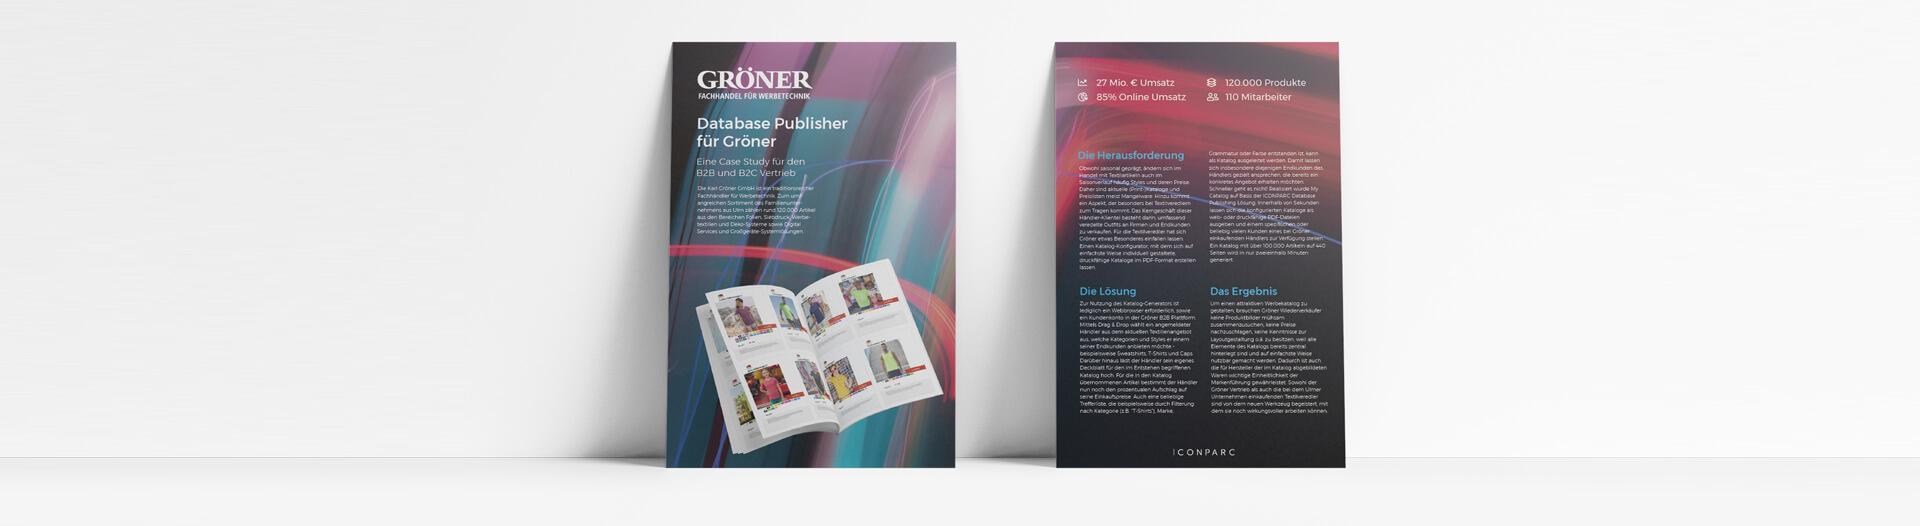 ICONPARC Case Study groener DB Whitepaper